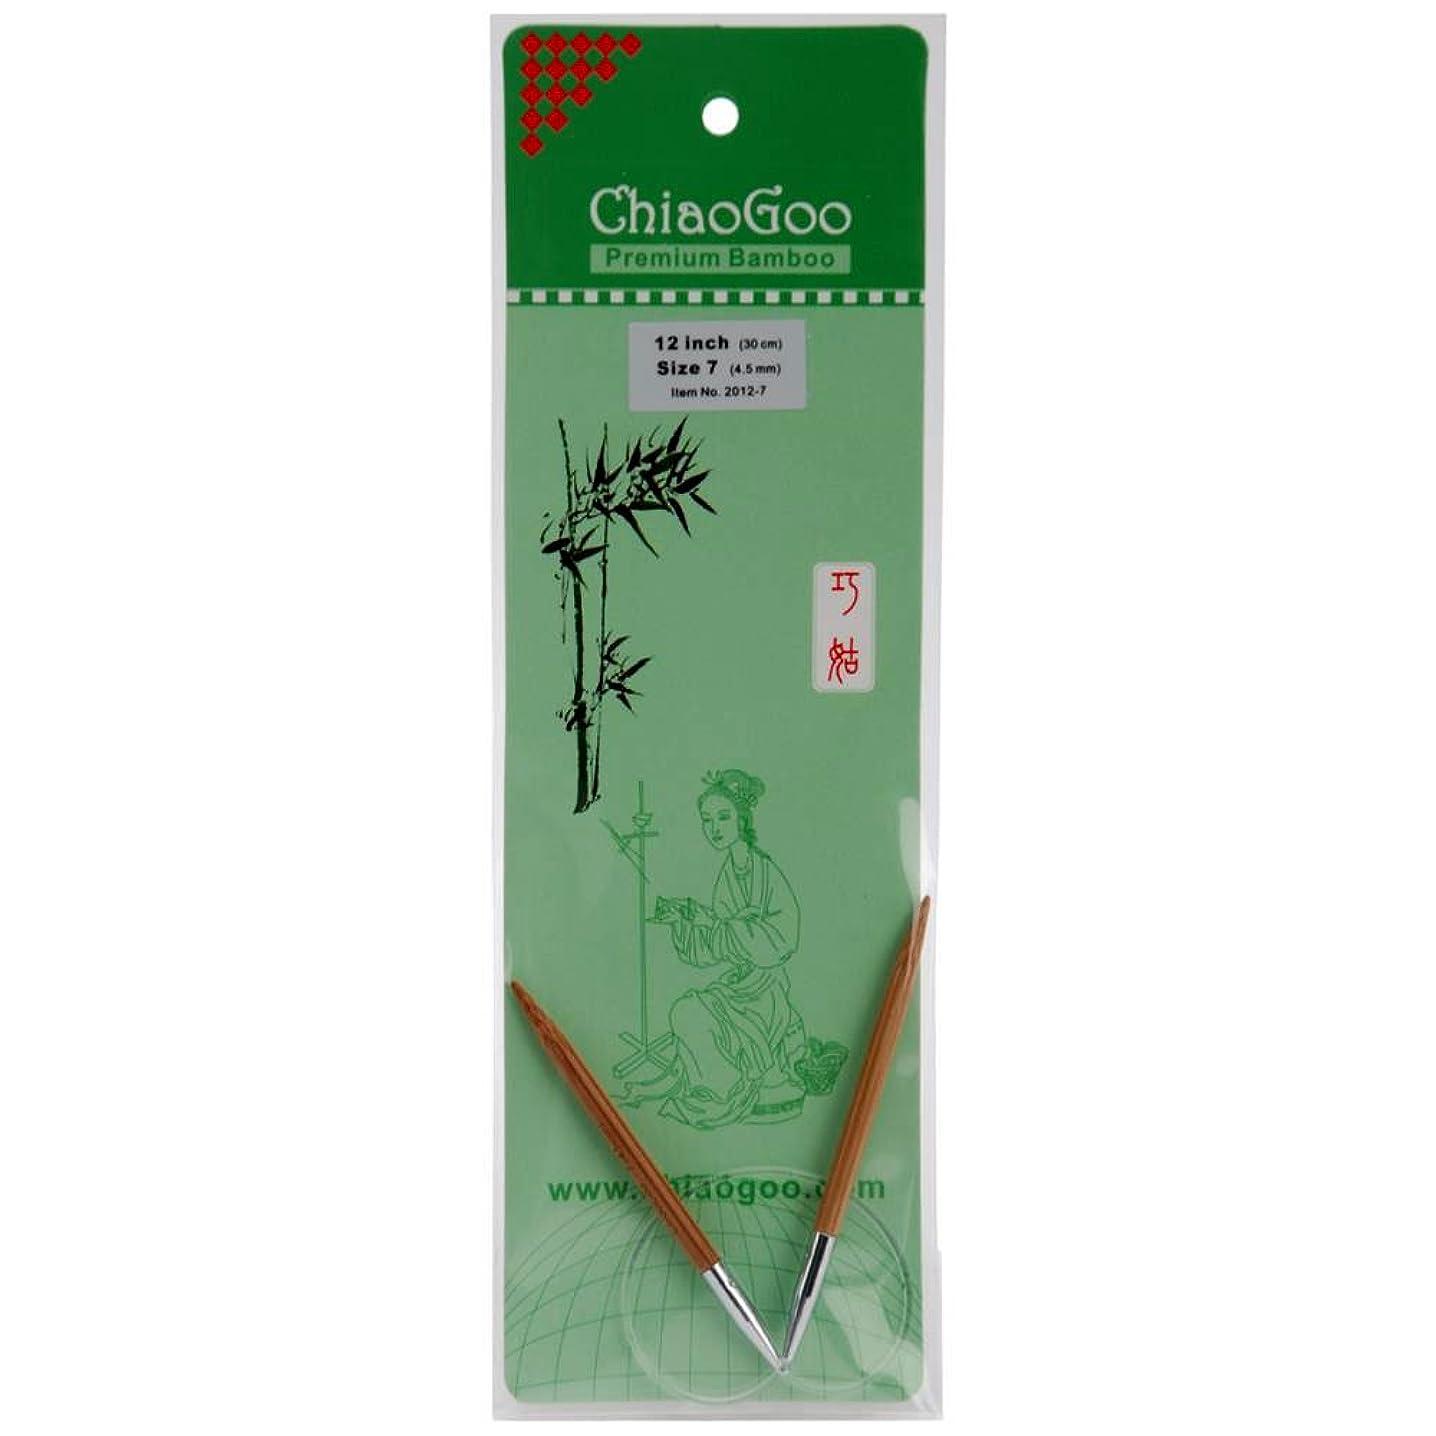 ChiaoGoo Circular 12-inch (30cm) Bamboo Dark Patina Knitting Needle; Size US 5 (3.75mm) 2012-5